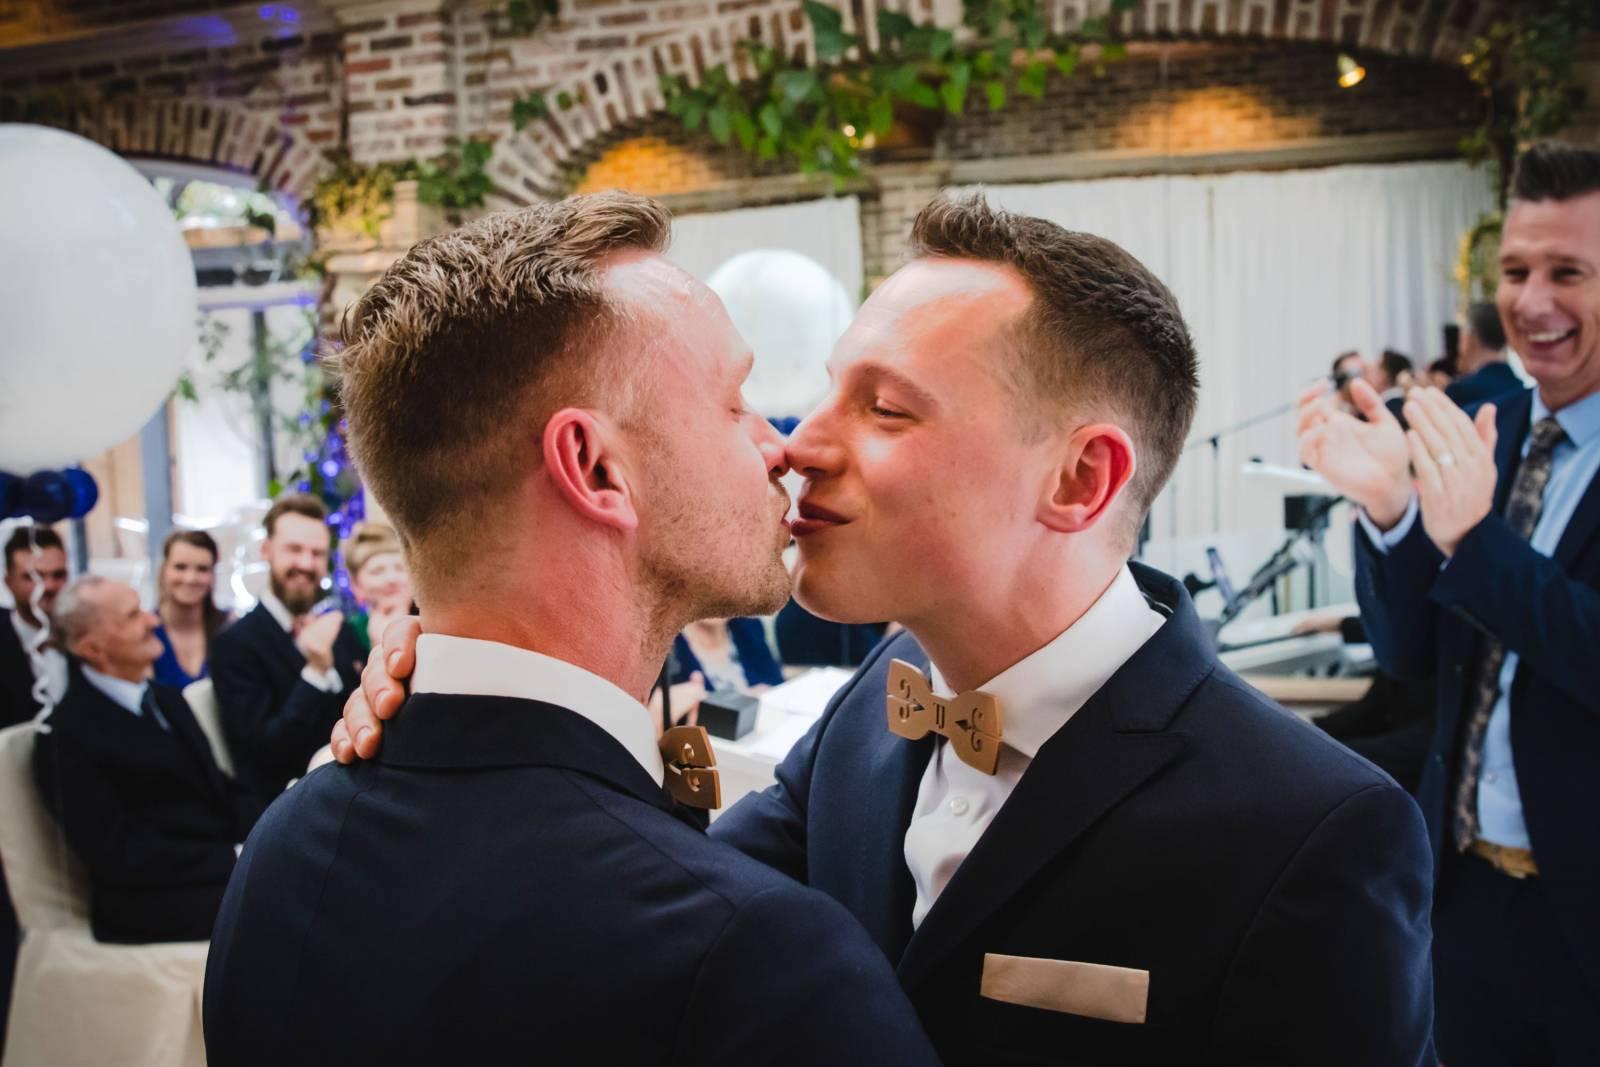 Live 4 Love - Ceremoniespreker - House of Weddings - 24